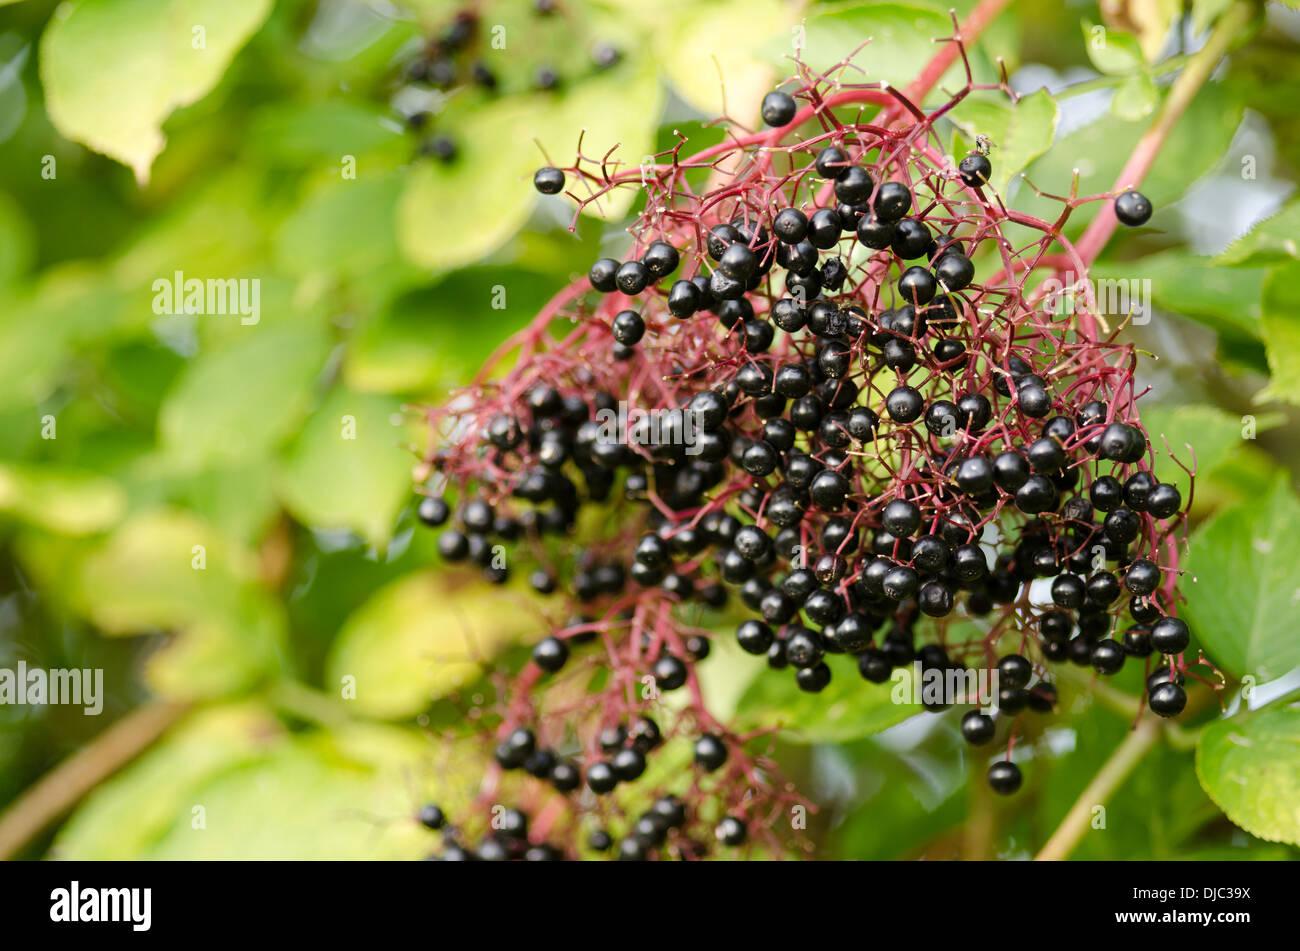 Twig of elderberry, Sambucus nigra, elder with ripe fruits - Stock Image